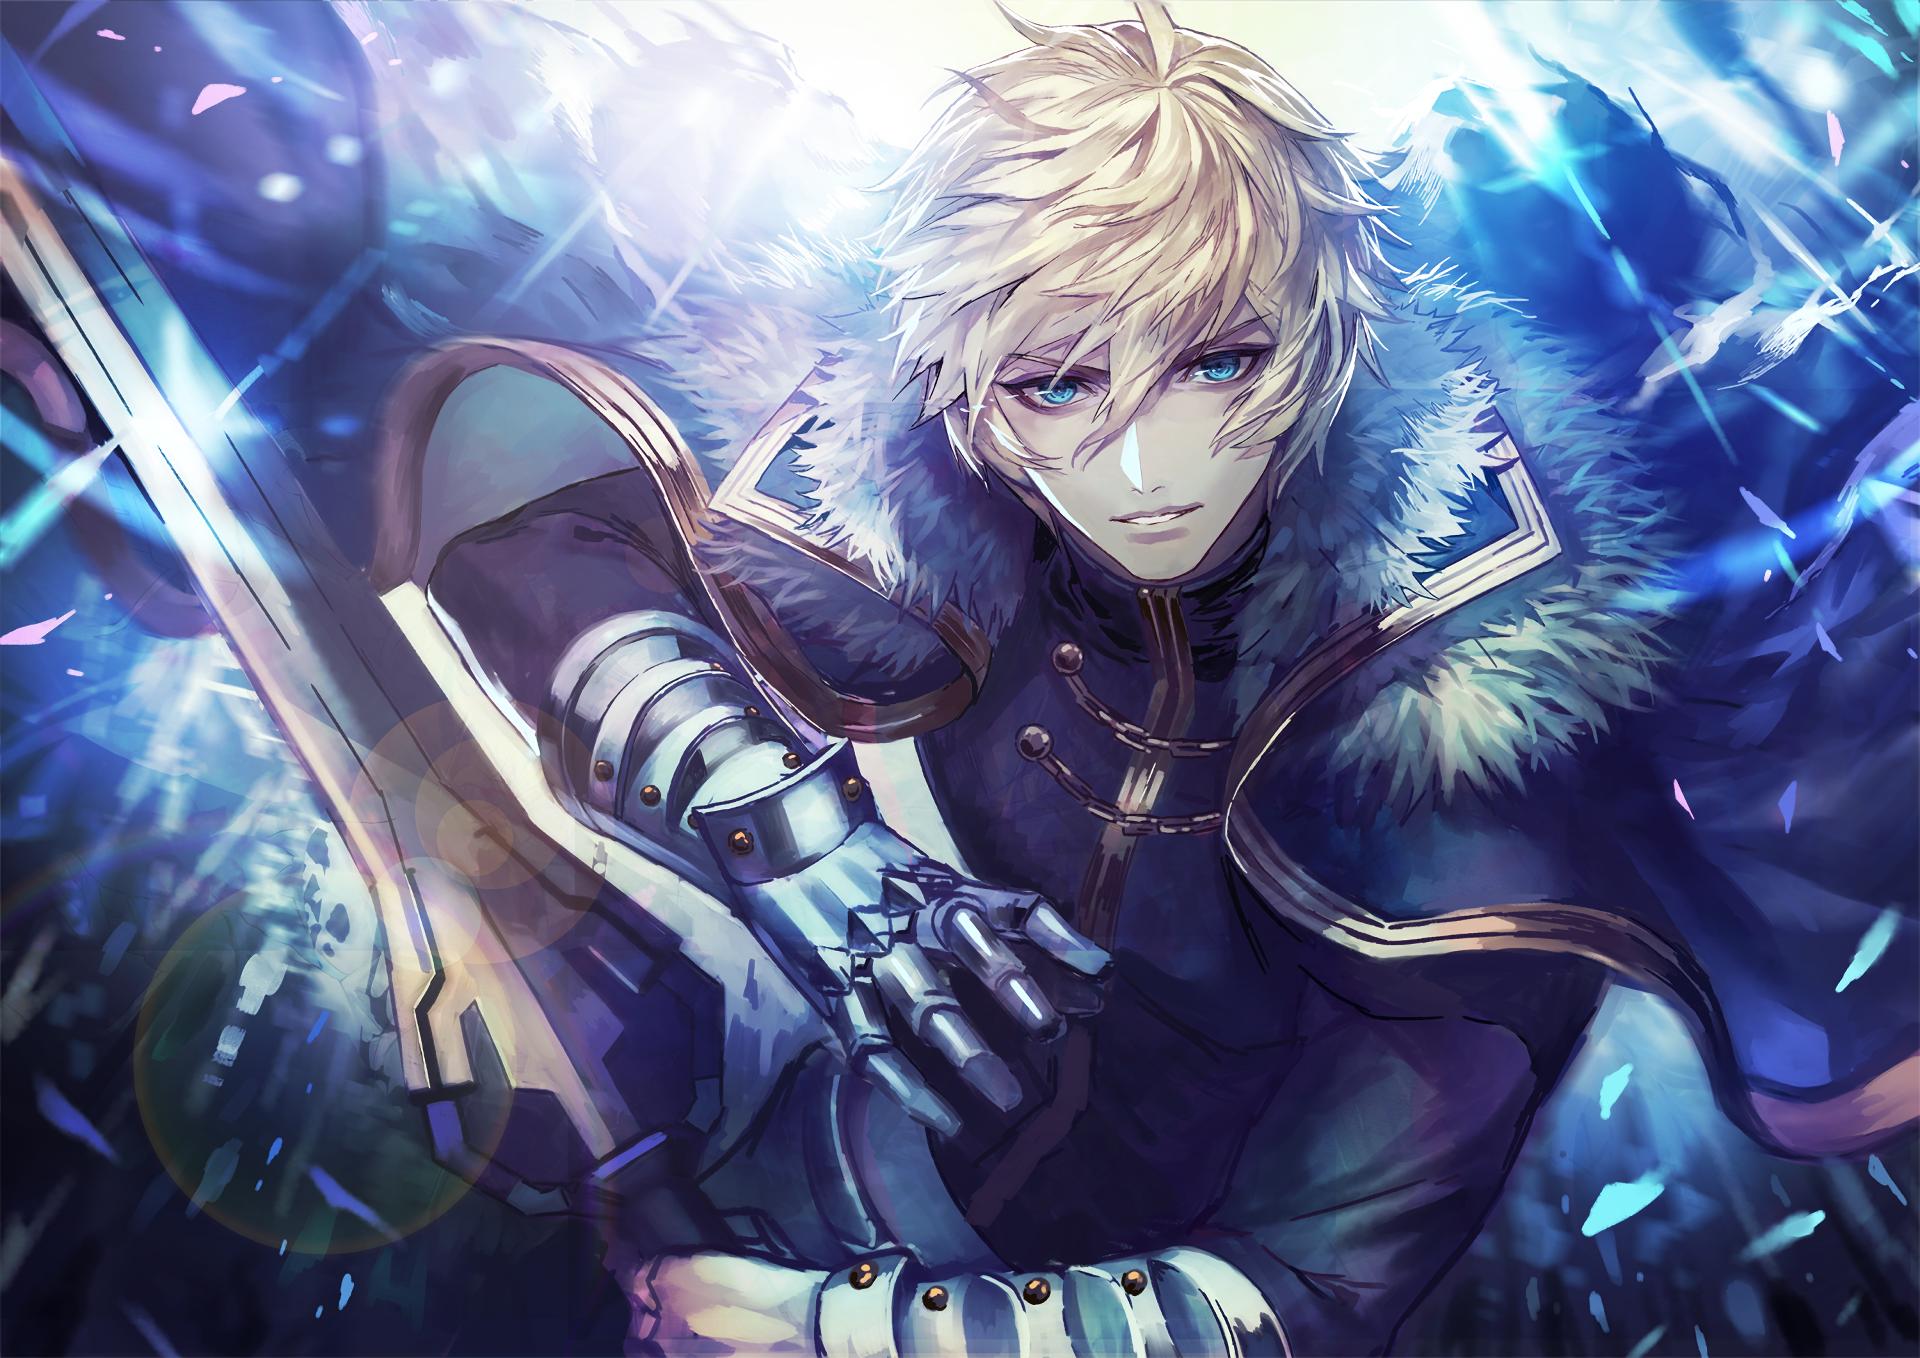 Anime - Fate/Grand Order  Gawain (Fate/Grand Order) Wallpaper